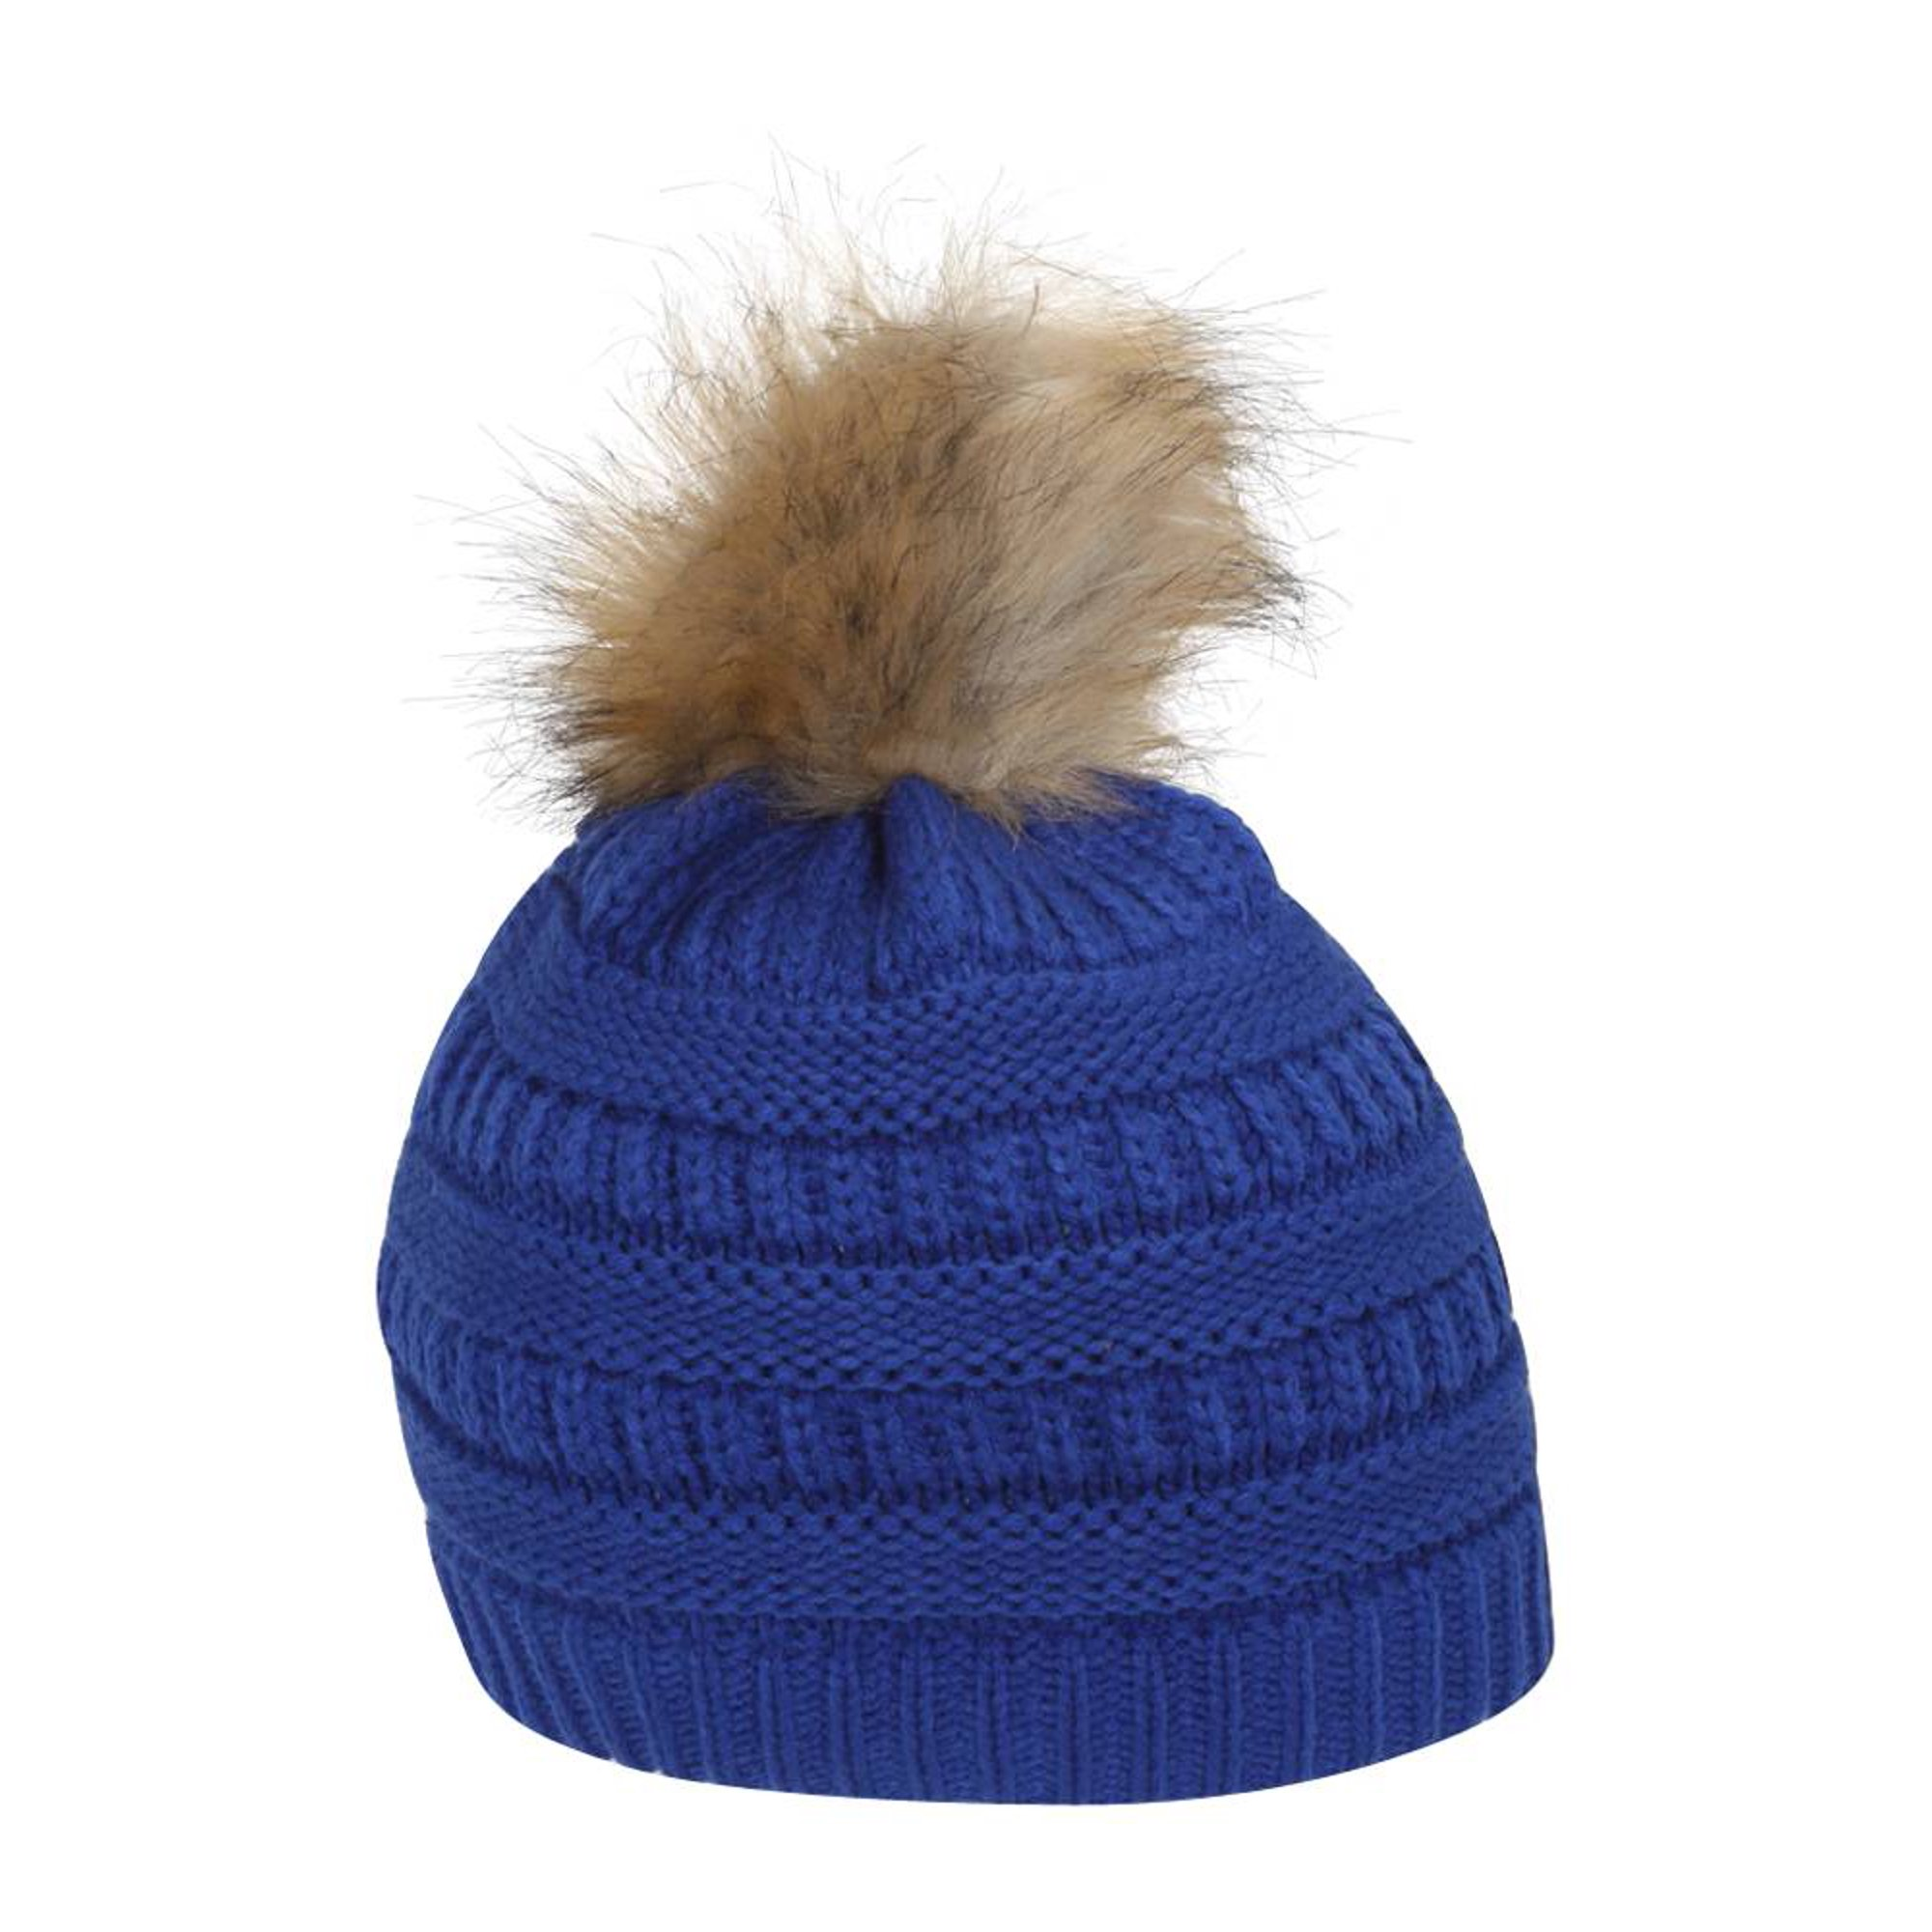 69dc4351ac4 Gravity Threads Cable Knit Faux Fur Pom Pom Beanie Hat